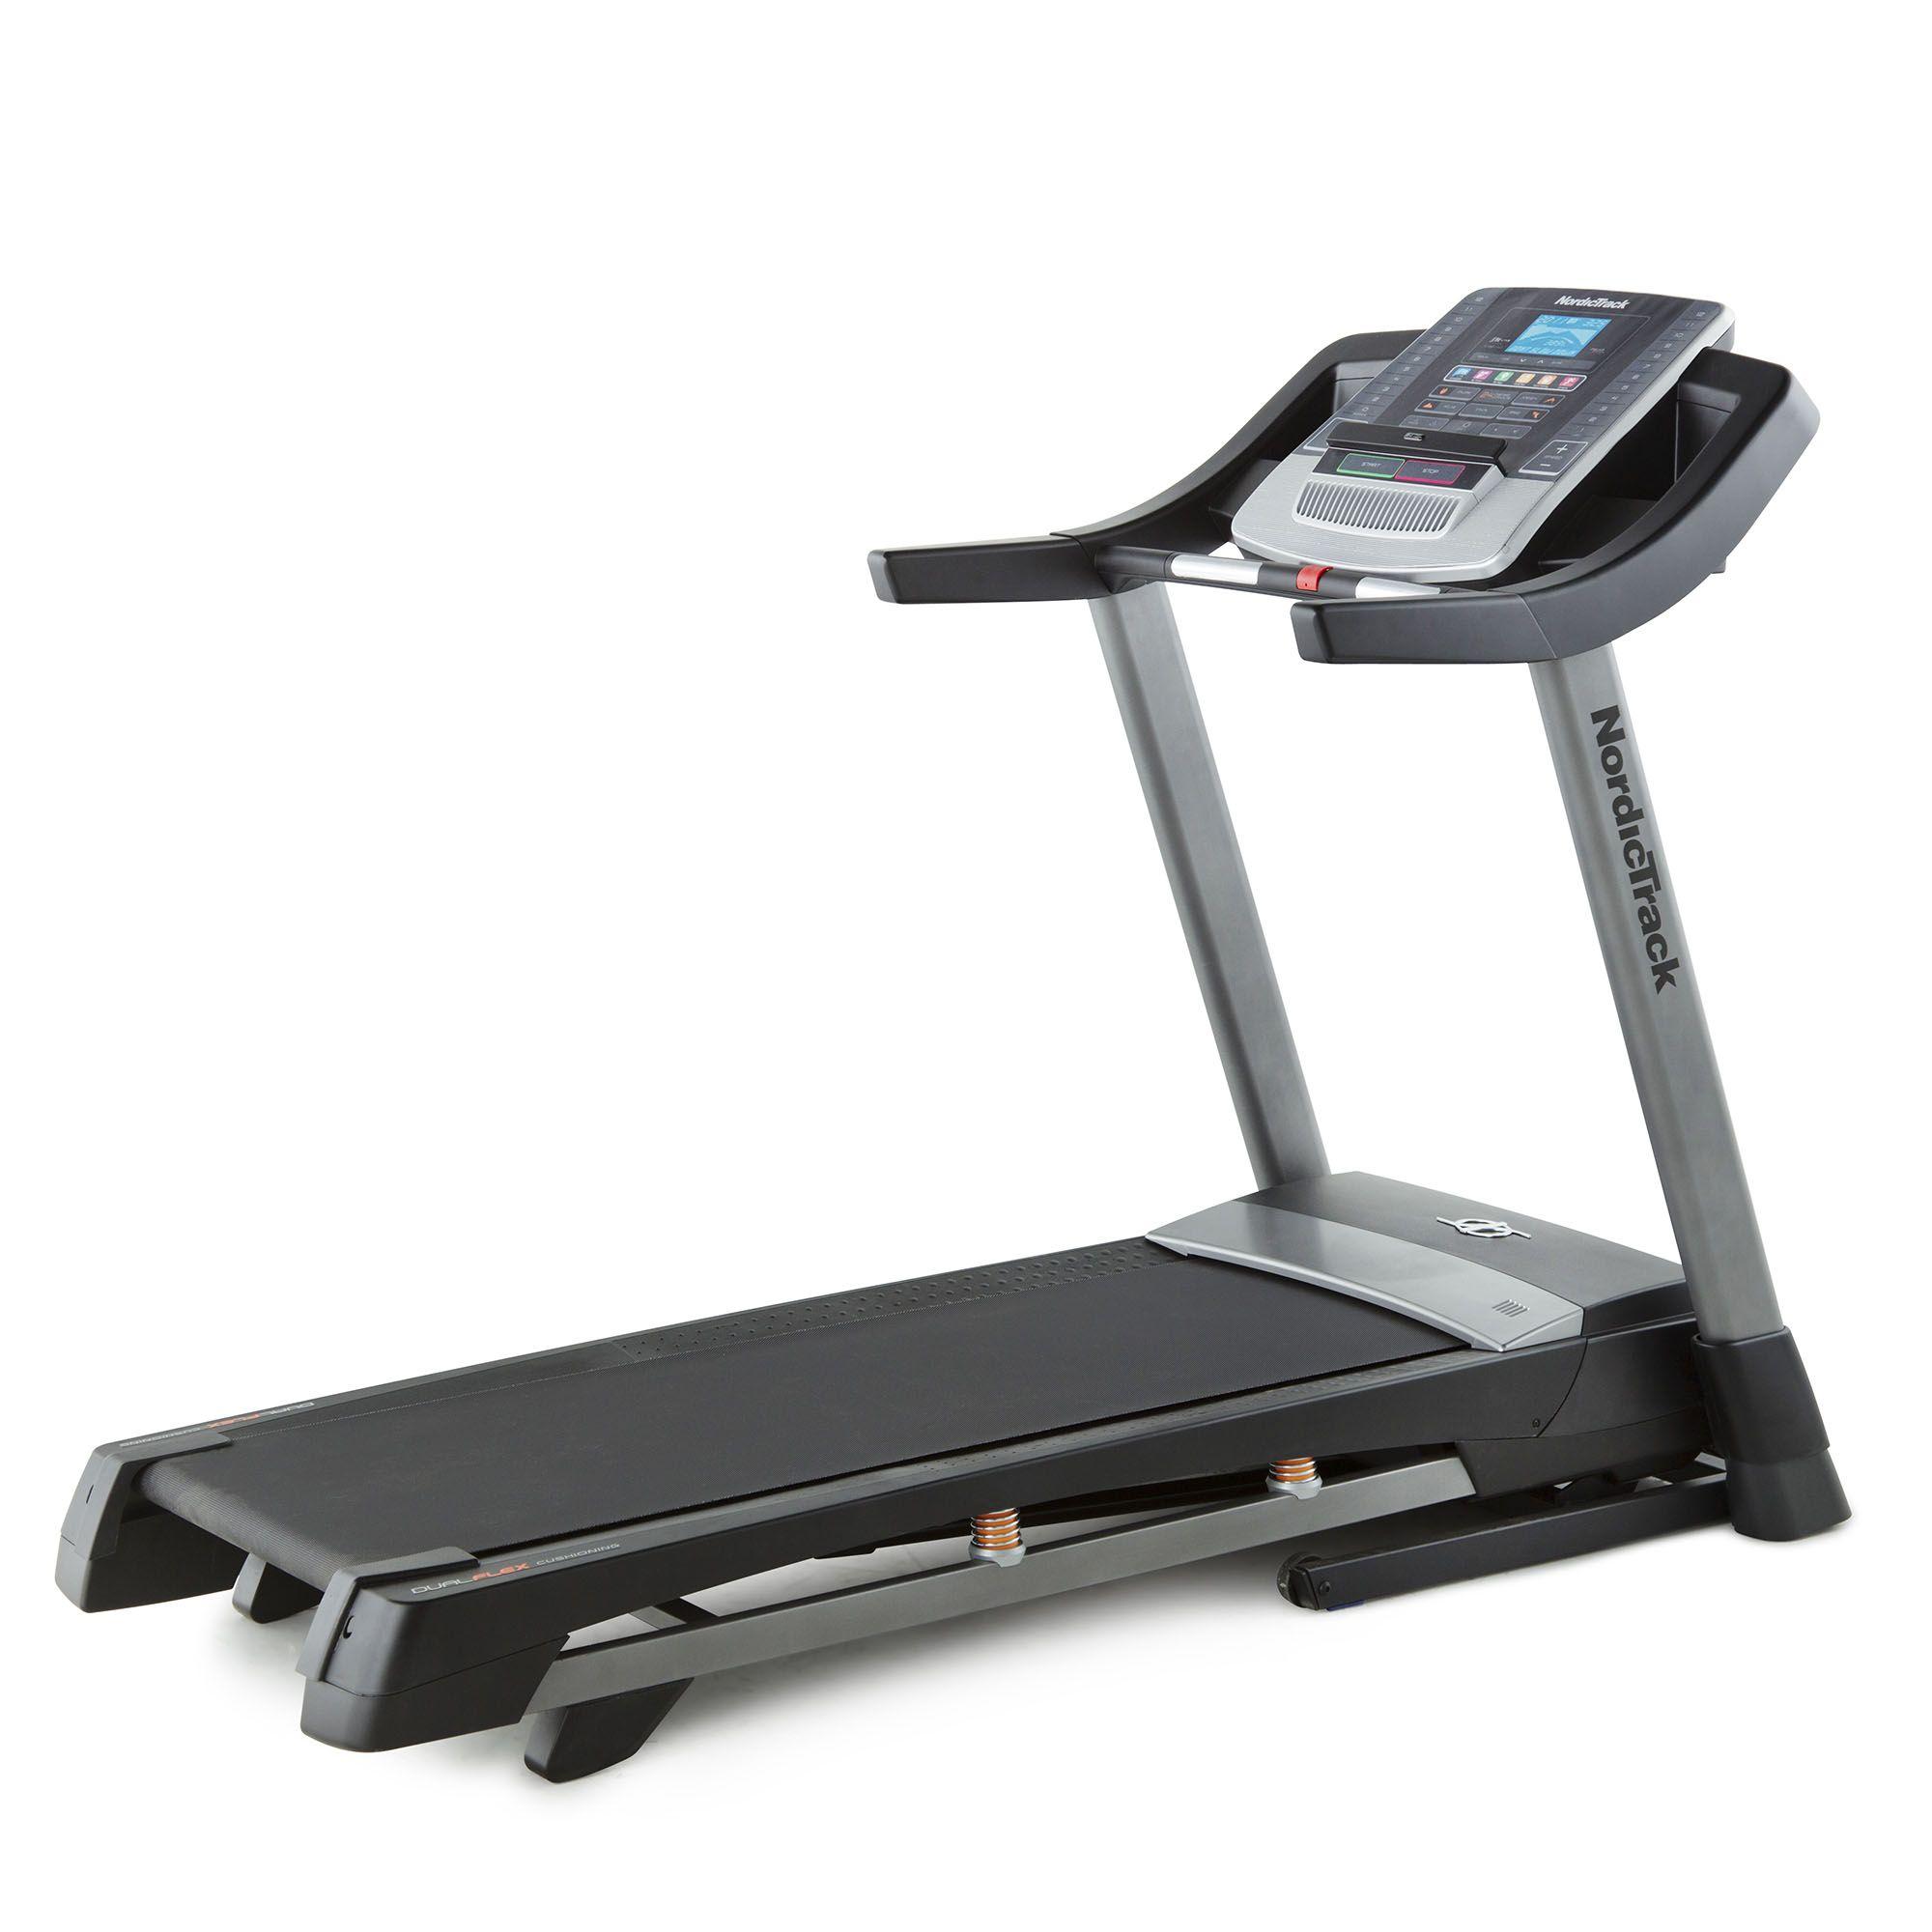 NordicTrack T12.2 Treadmill